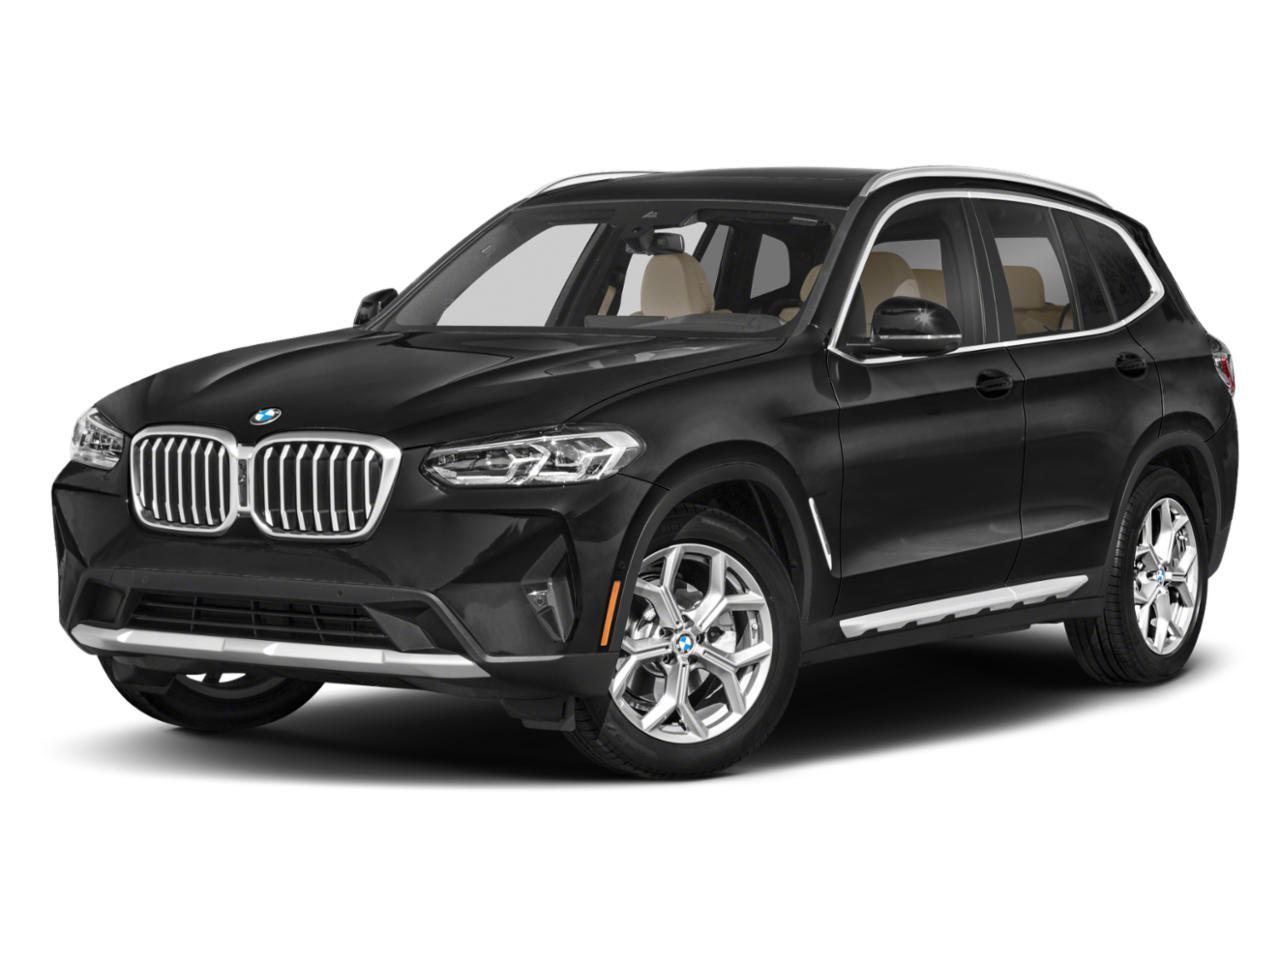 2022 BMW X3 sDrive30i Vehicle Photo in PLANO, TX 75024-3599